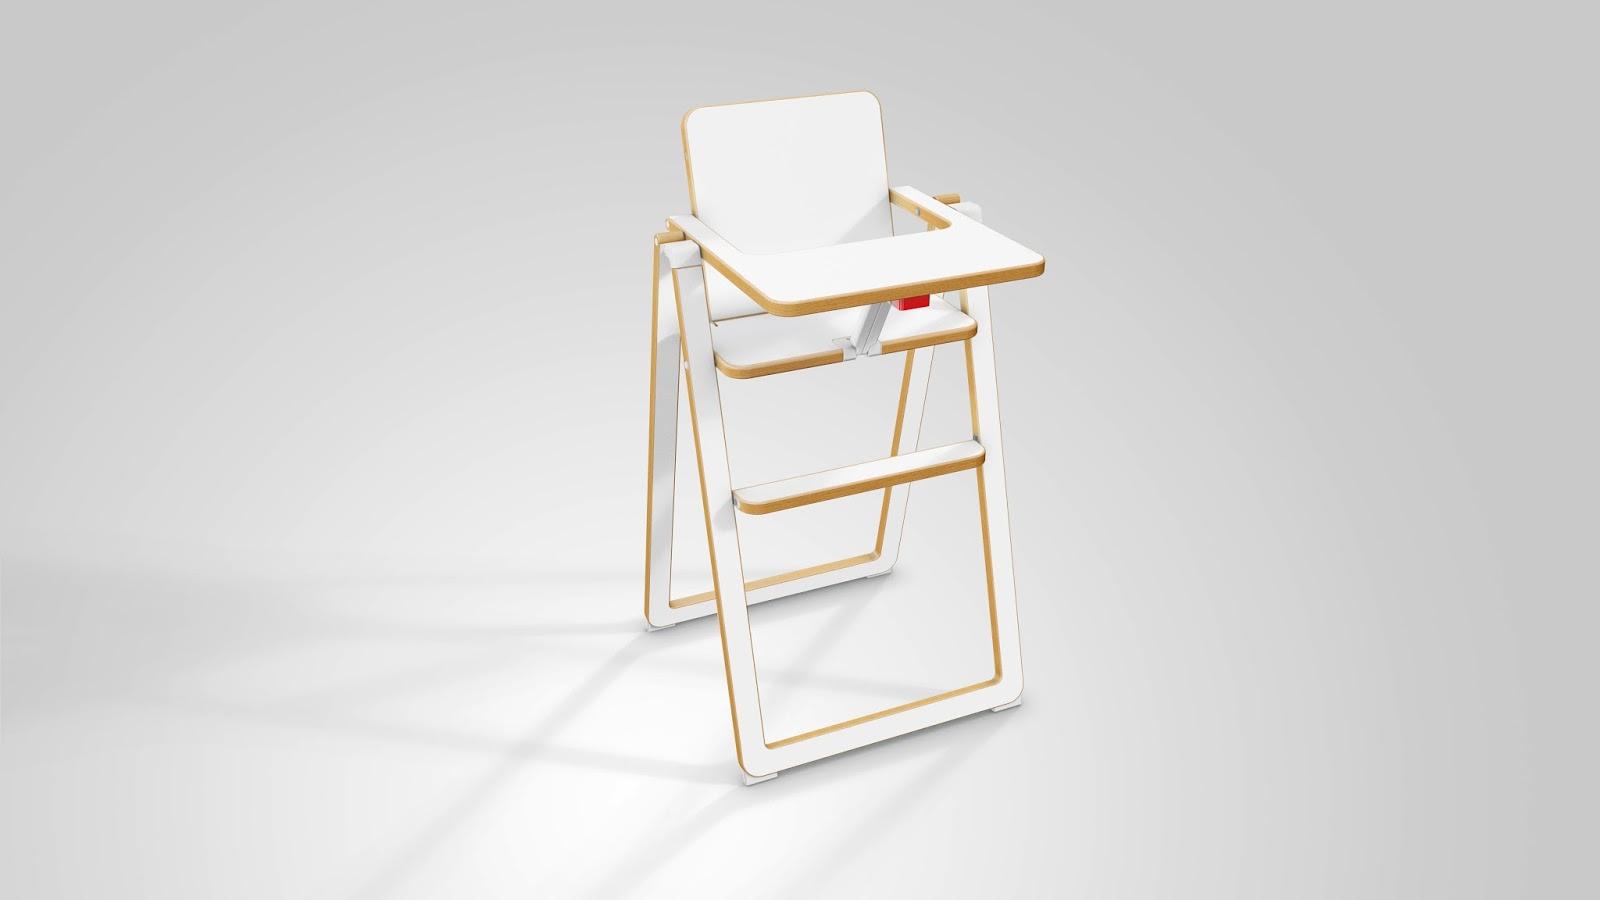 Chaise haute pliante ultra plate supaflat natalys - Chaise haute bebe pliable ...